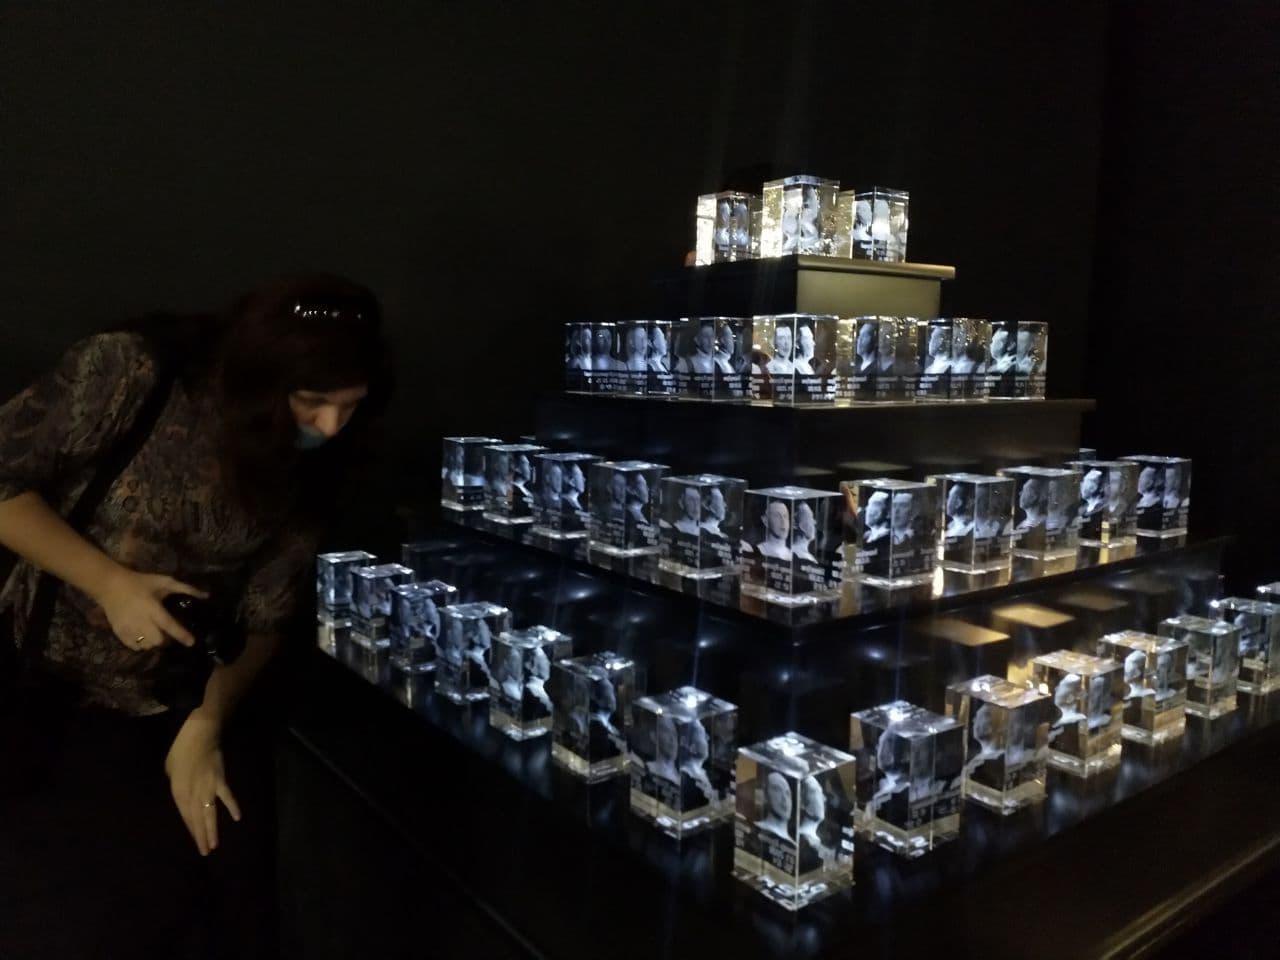 Владимир Кустов. Кристаллизация. Пирамида. 2009